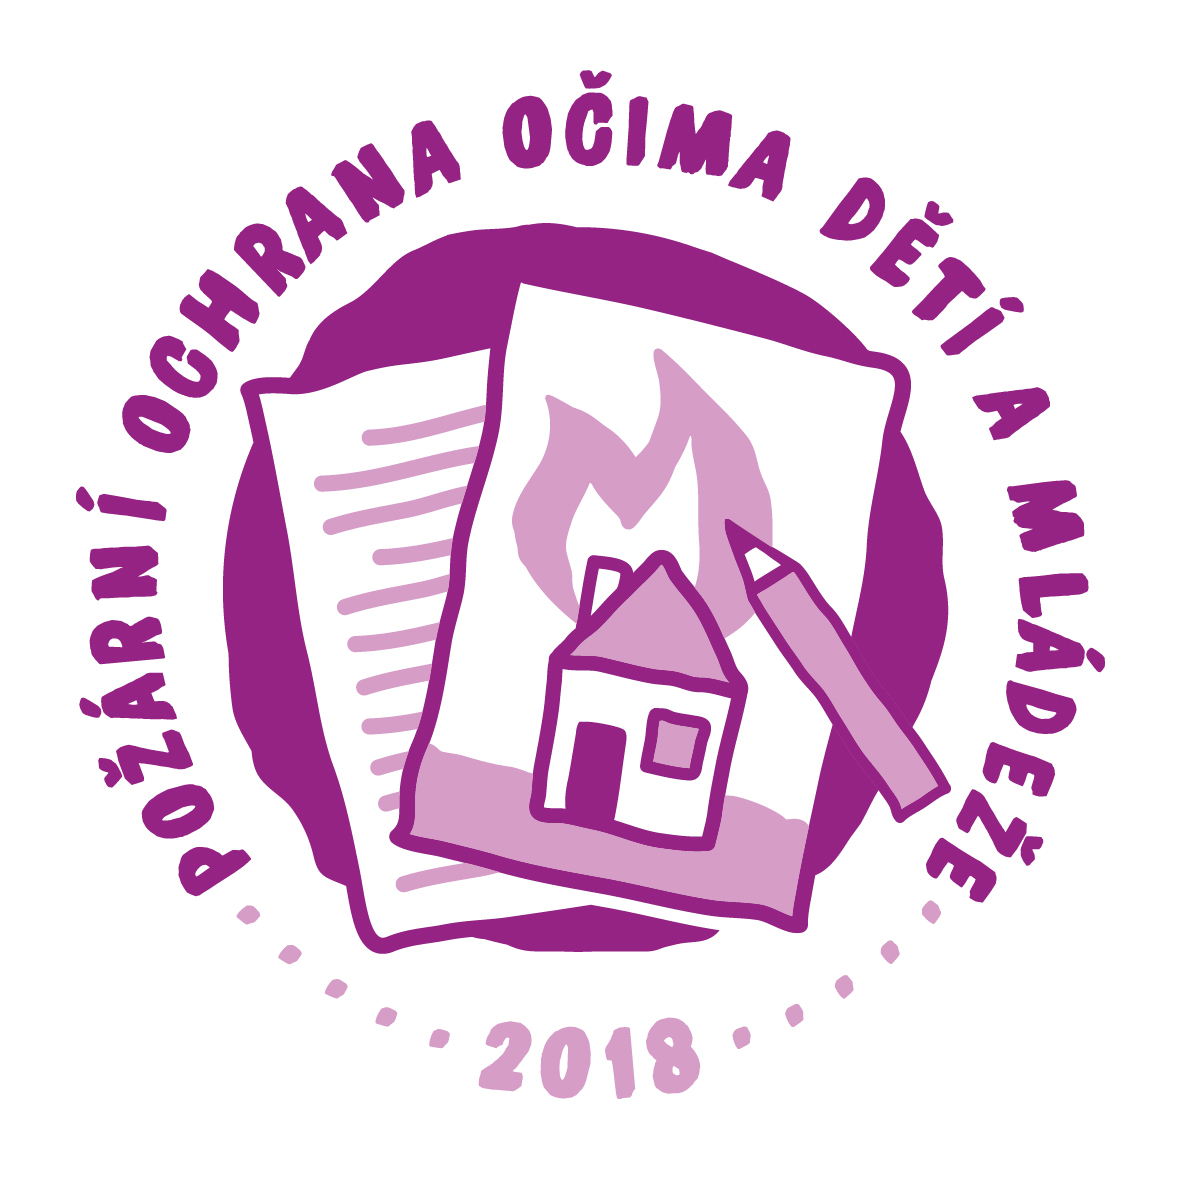 logo pood 2018 barva